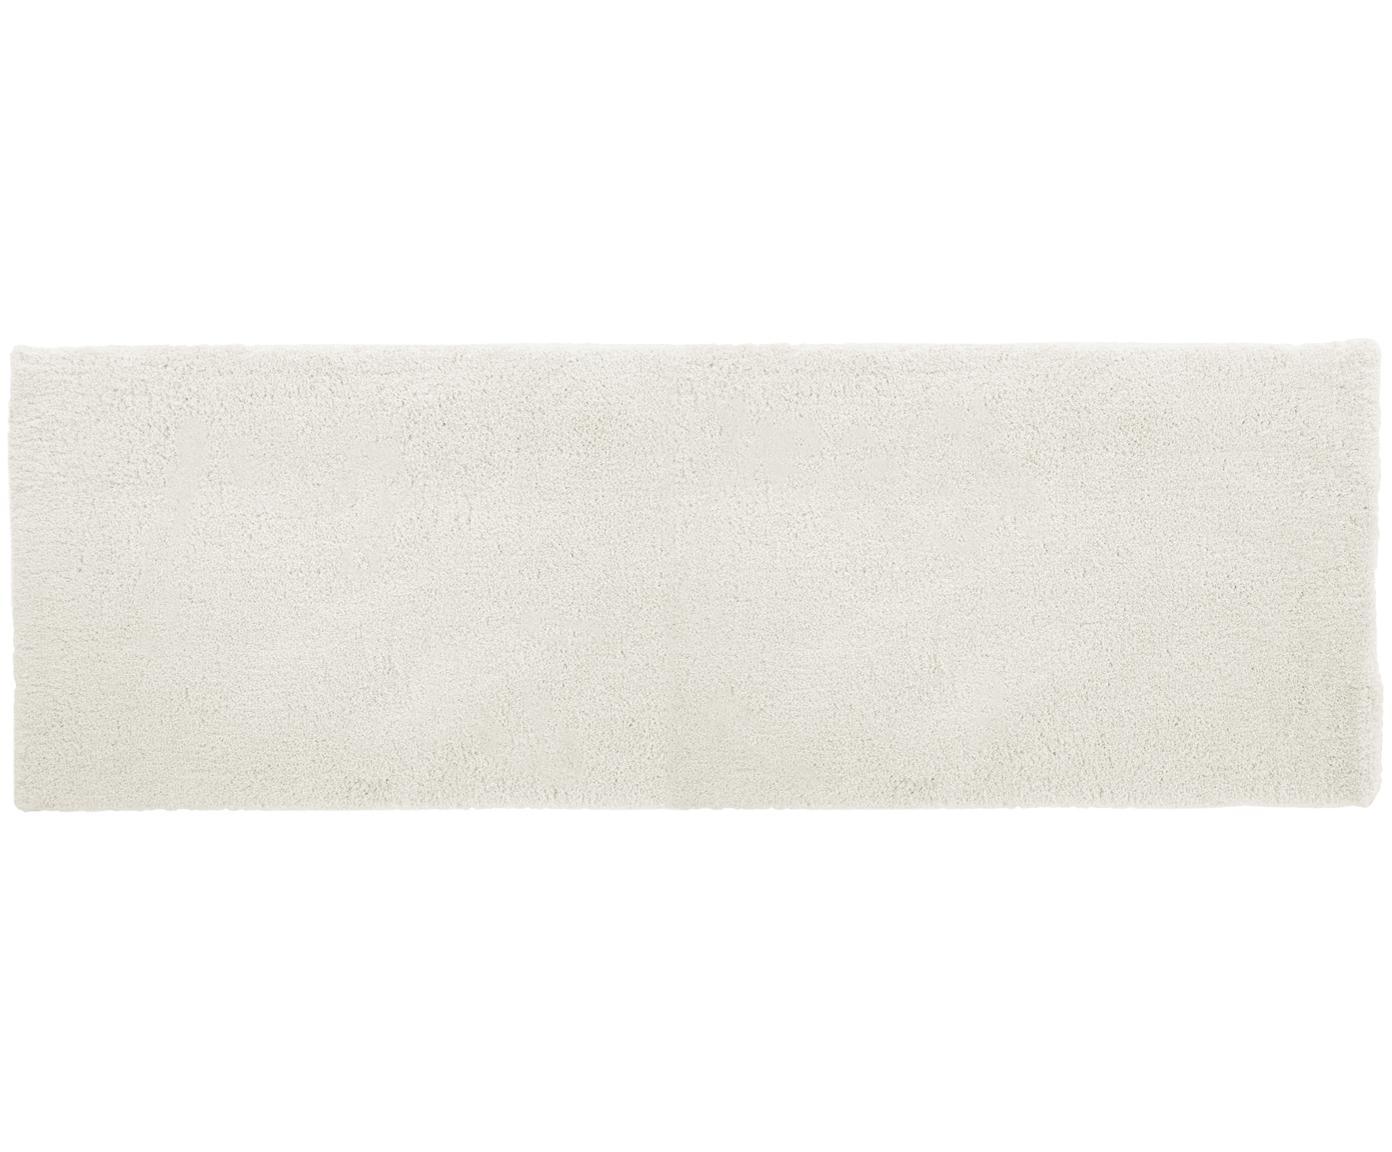 Passatoia pelosa morbida color cremaLeighton, Retro: 100% poliestere, Crema, Larg. 80 x Lung. 250 cm